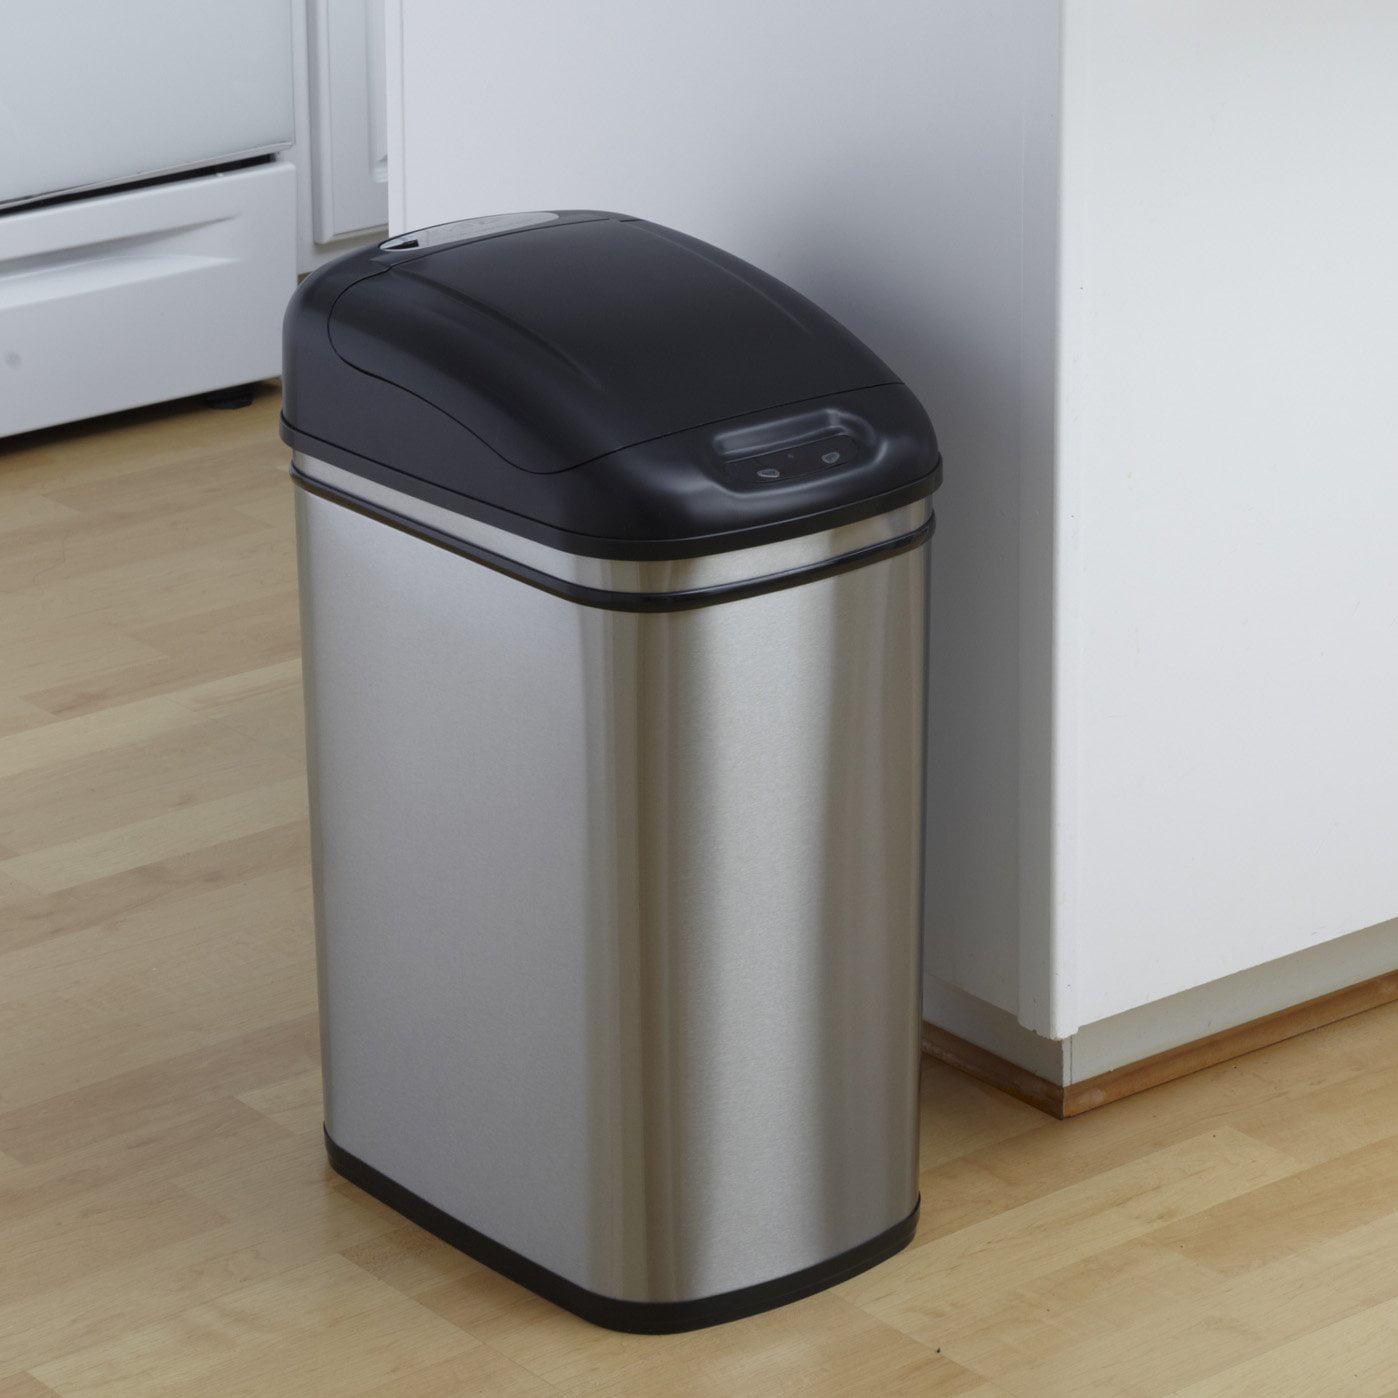 Nine Stars DZT-30-1 Touchless Stainless Steel 7.9 Gallon Trash Can -  Walmart.com